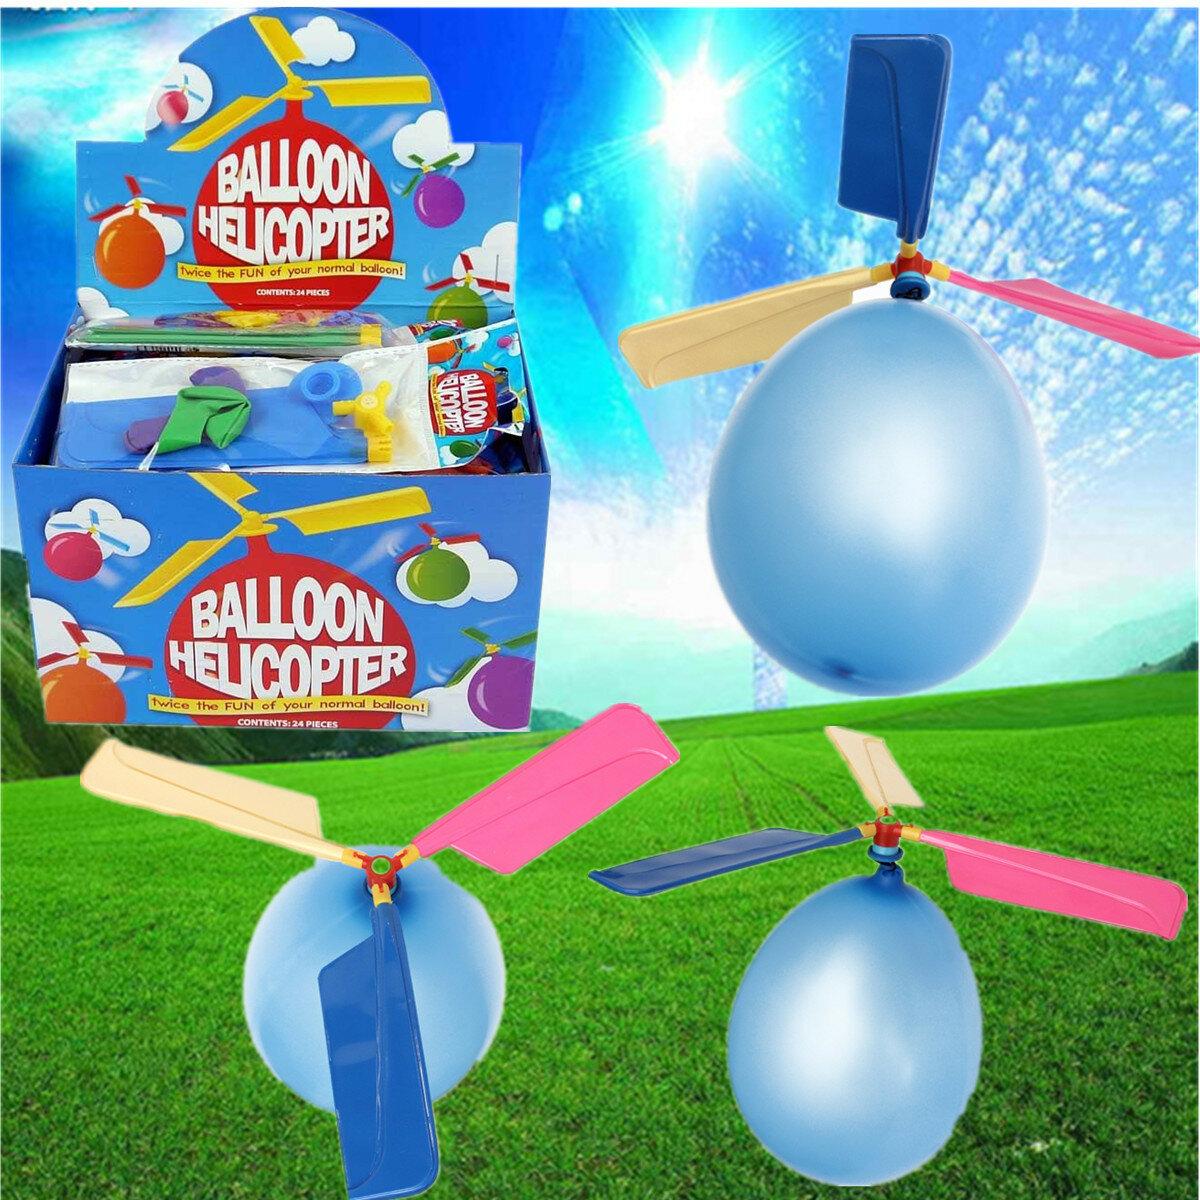 NEW 5.2ft Delta Triangle Kite Outdoor Fun Sports Toys Single Line - 1